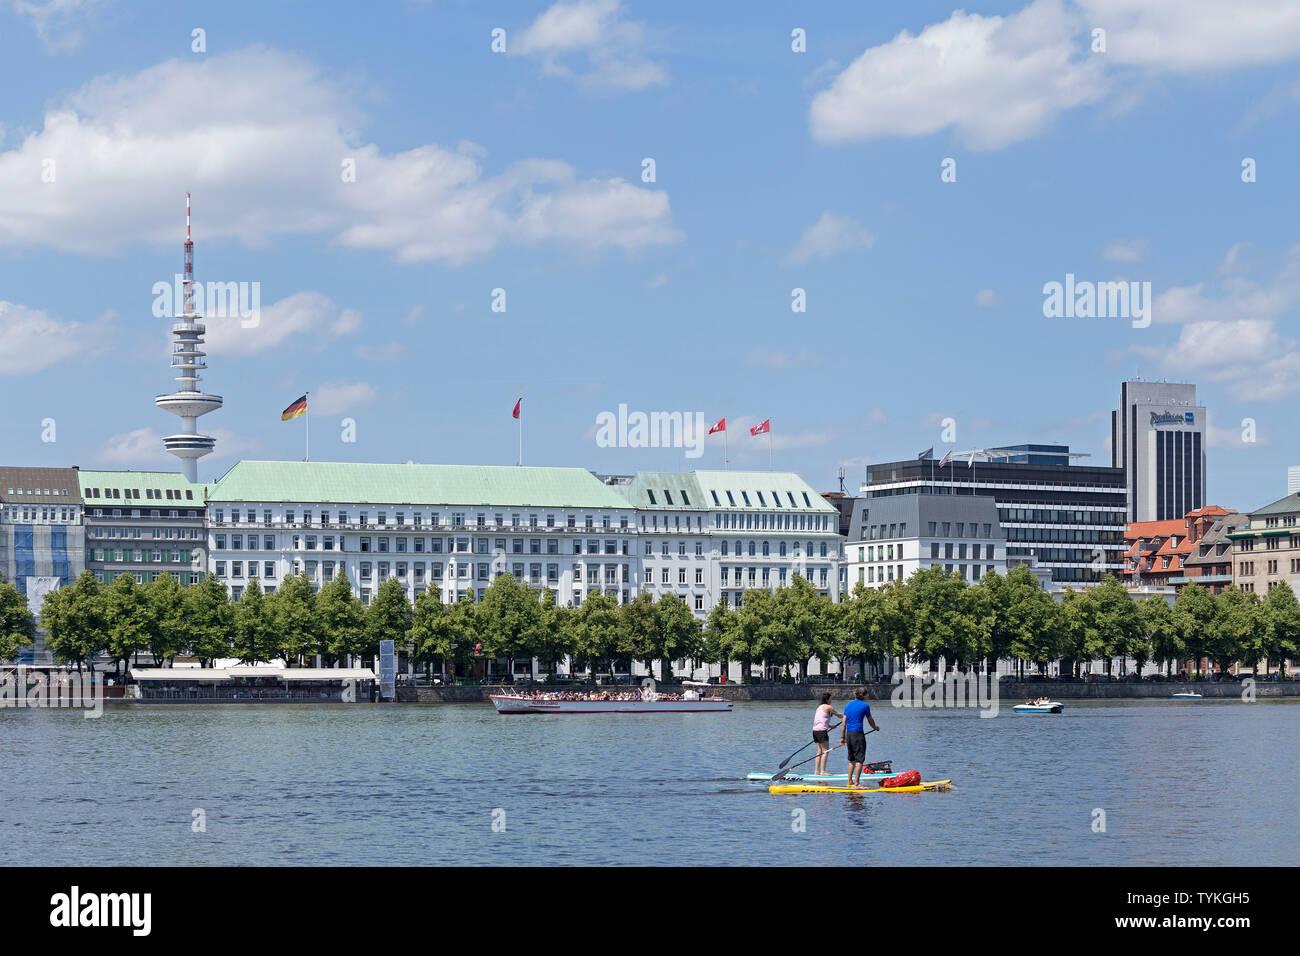 Neuer Jungfernstieg, Inner Alster, Hamburg, Germany - Stock Image